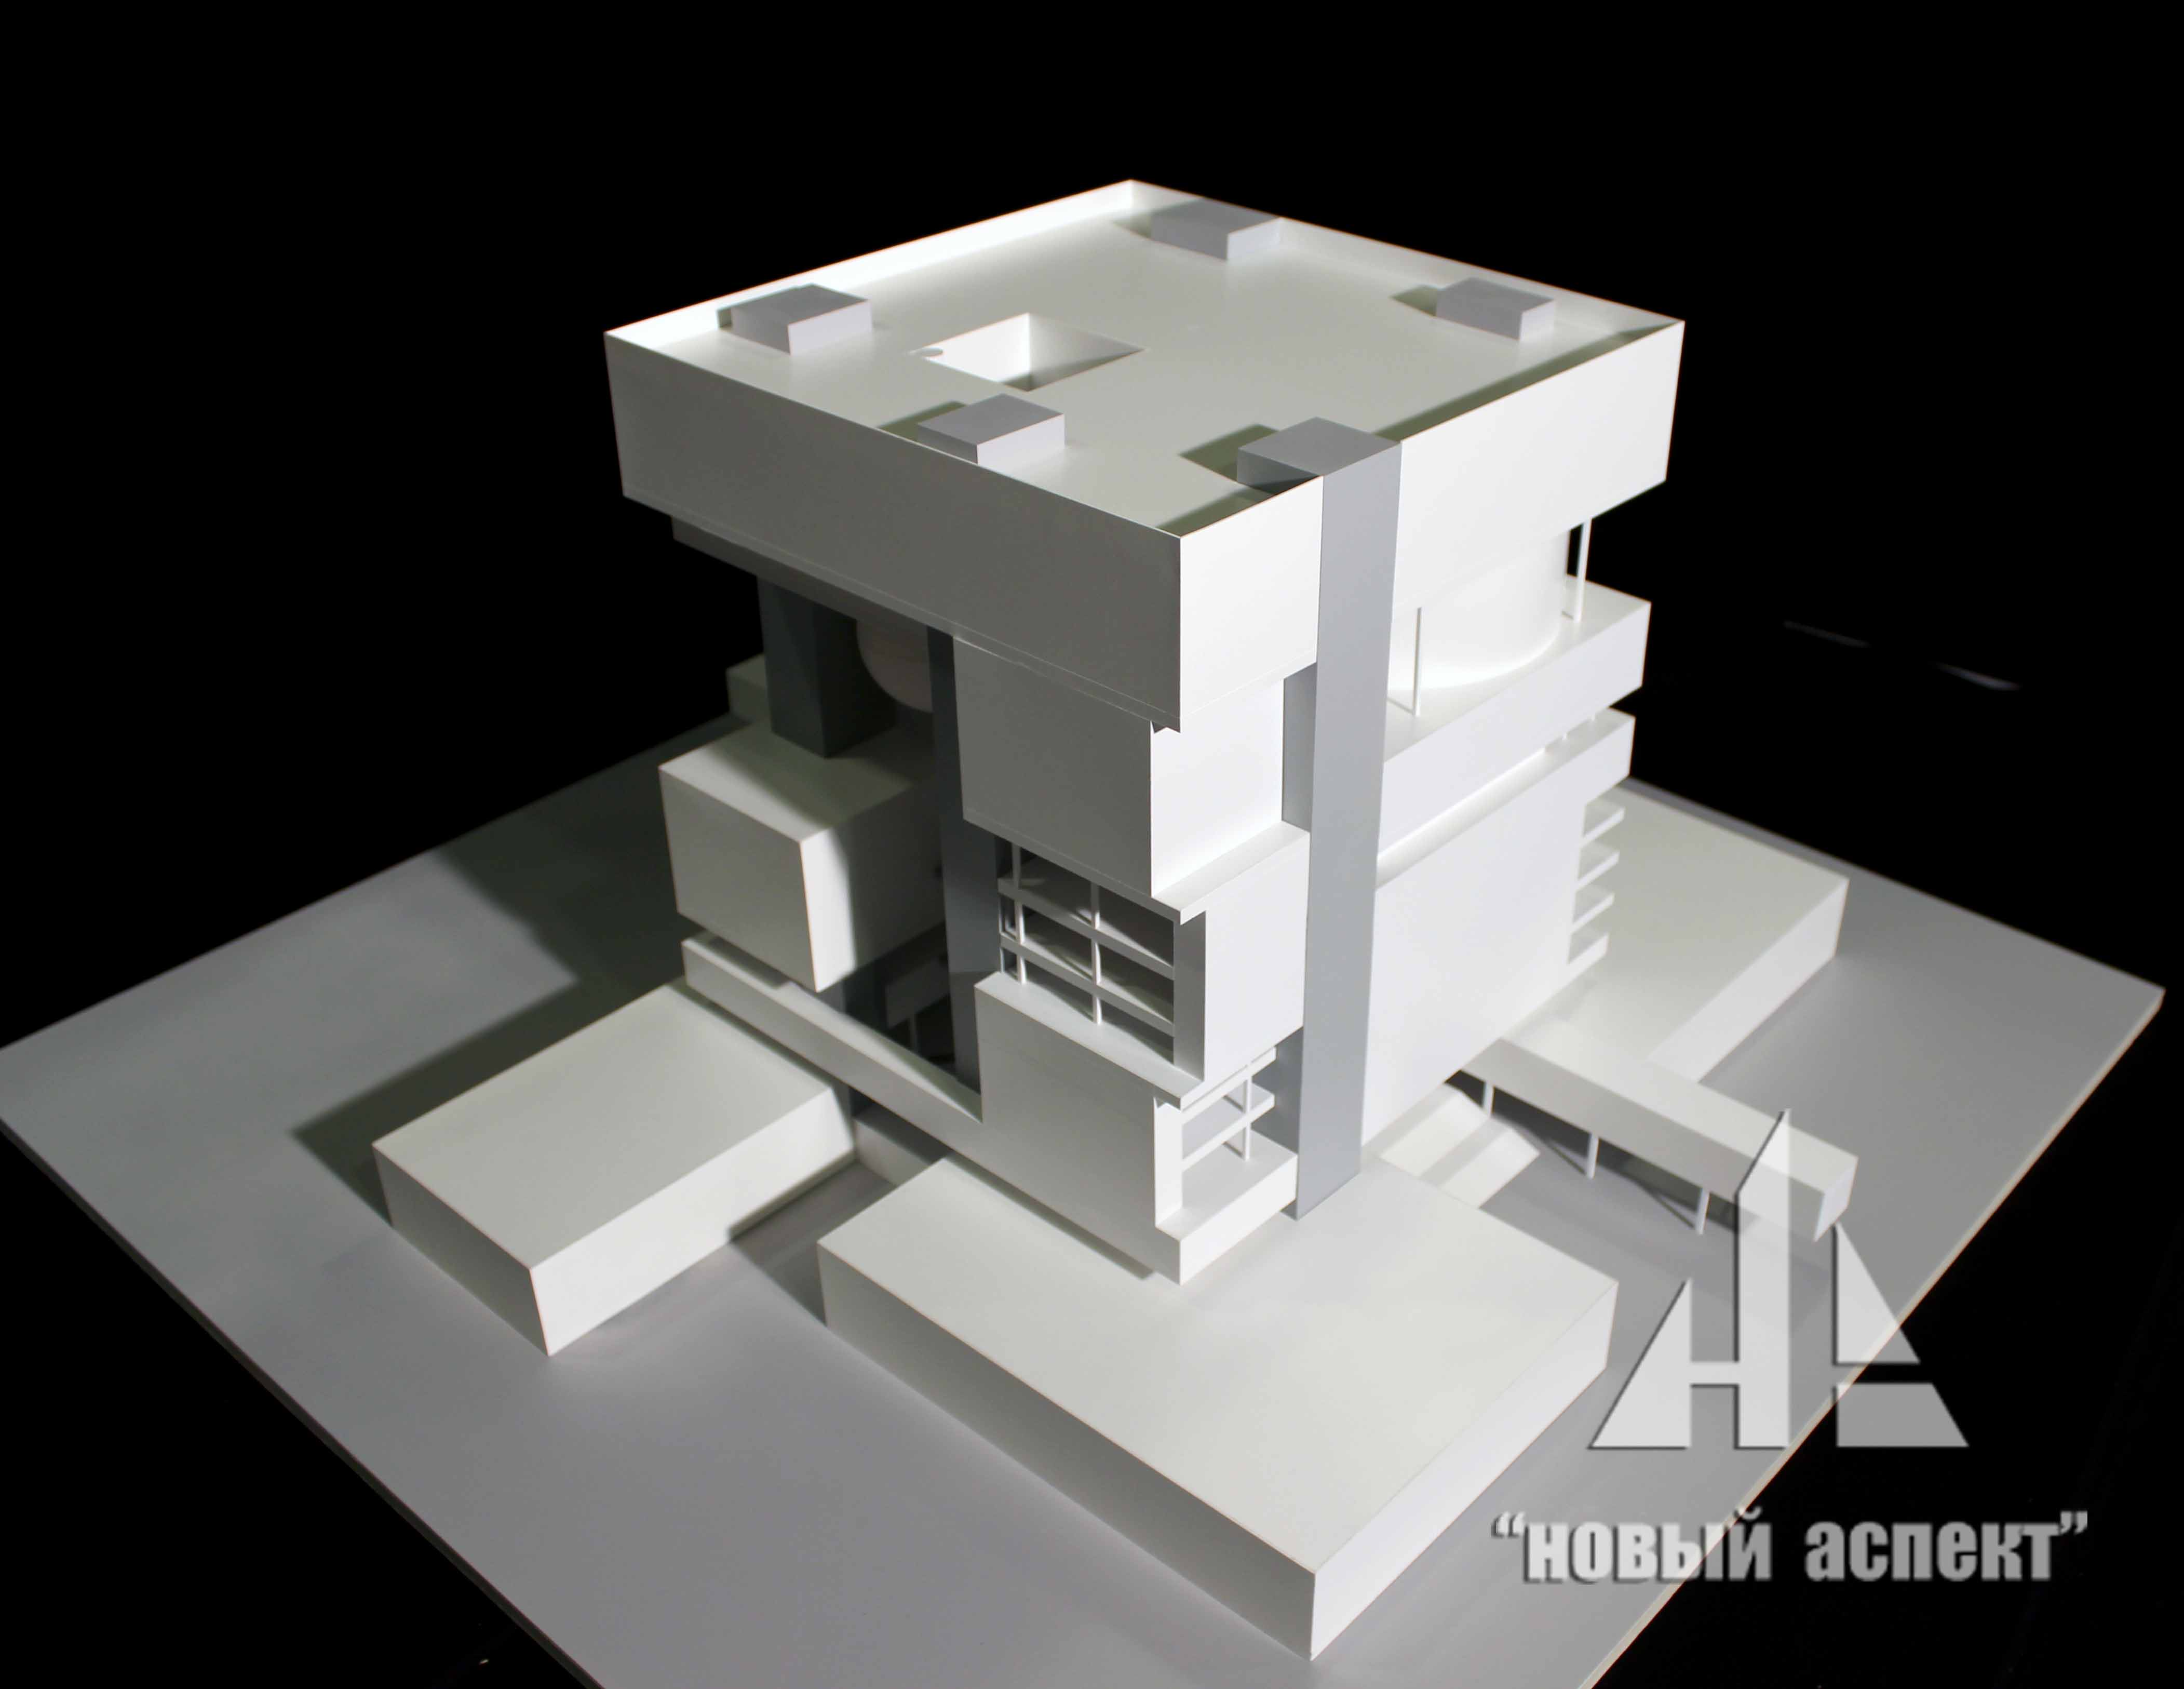 Макеты общественных зданий Жастар Эскиз (1)